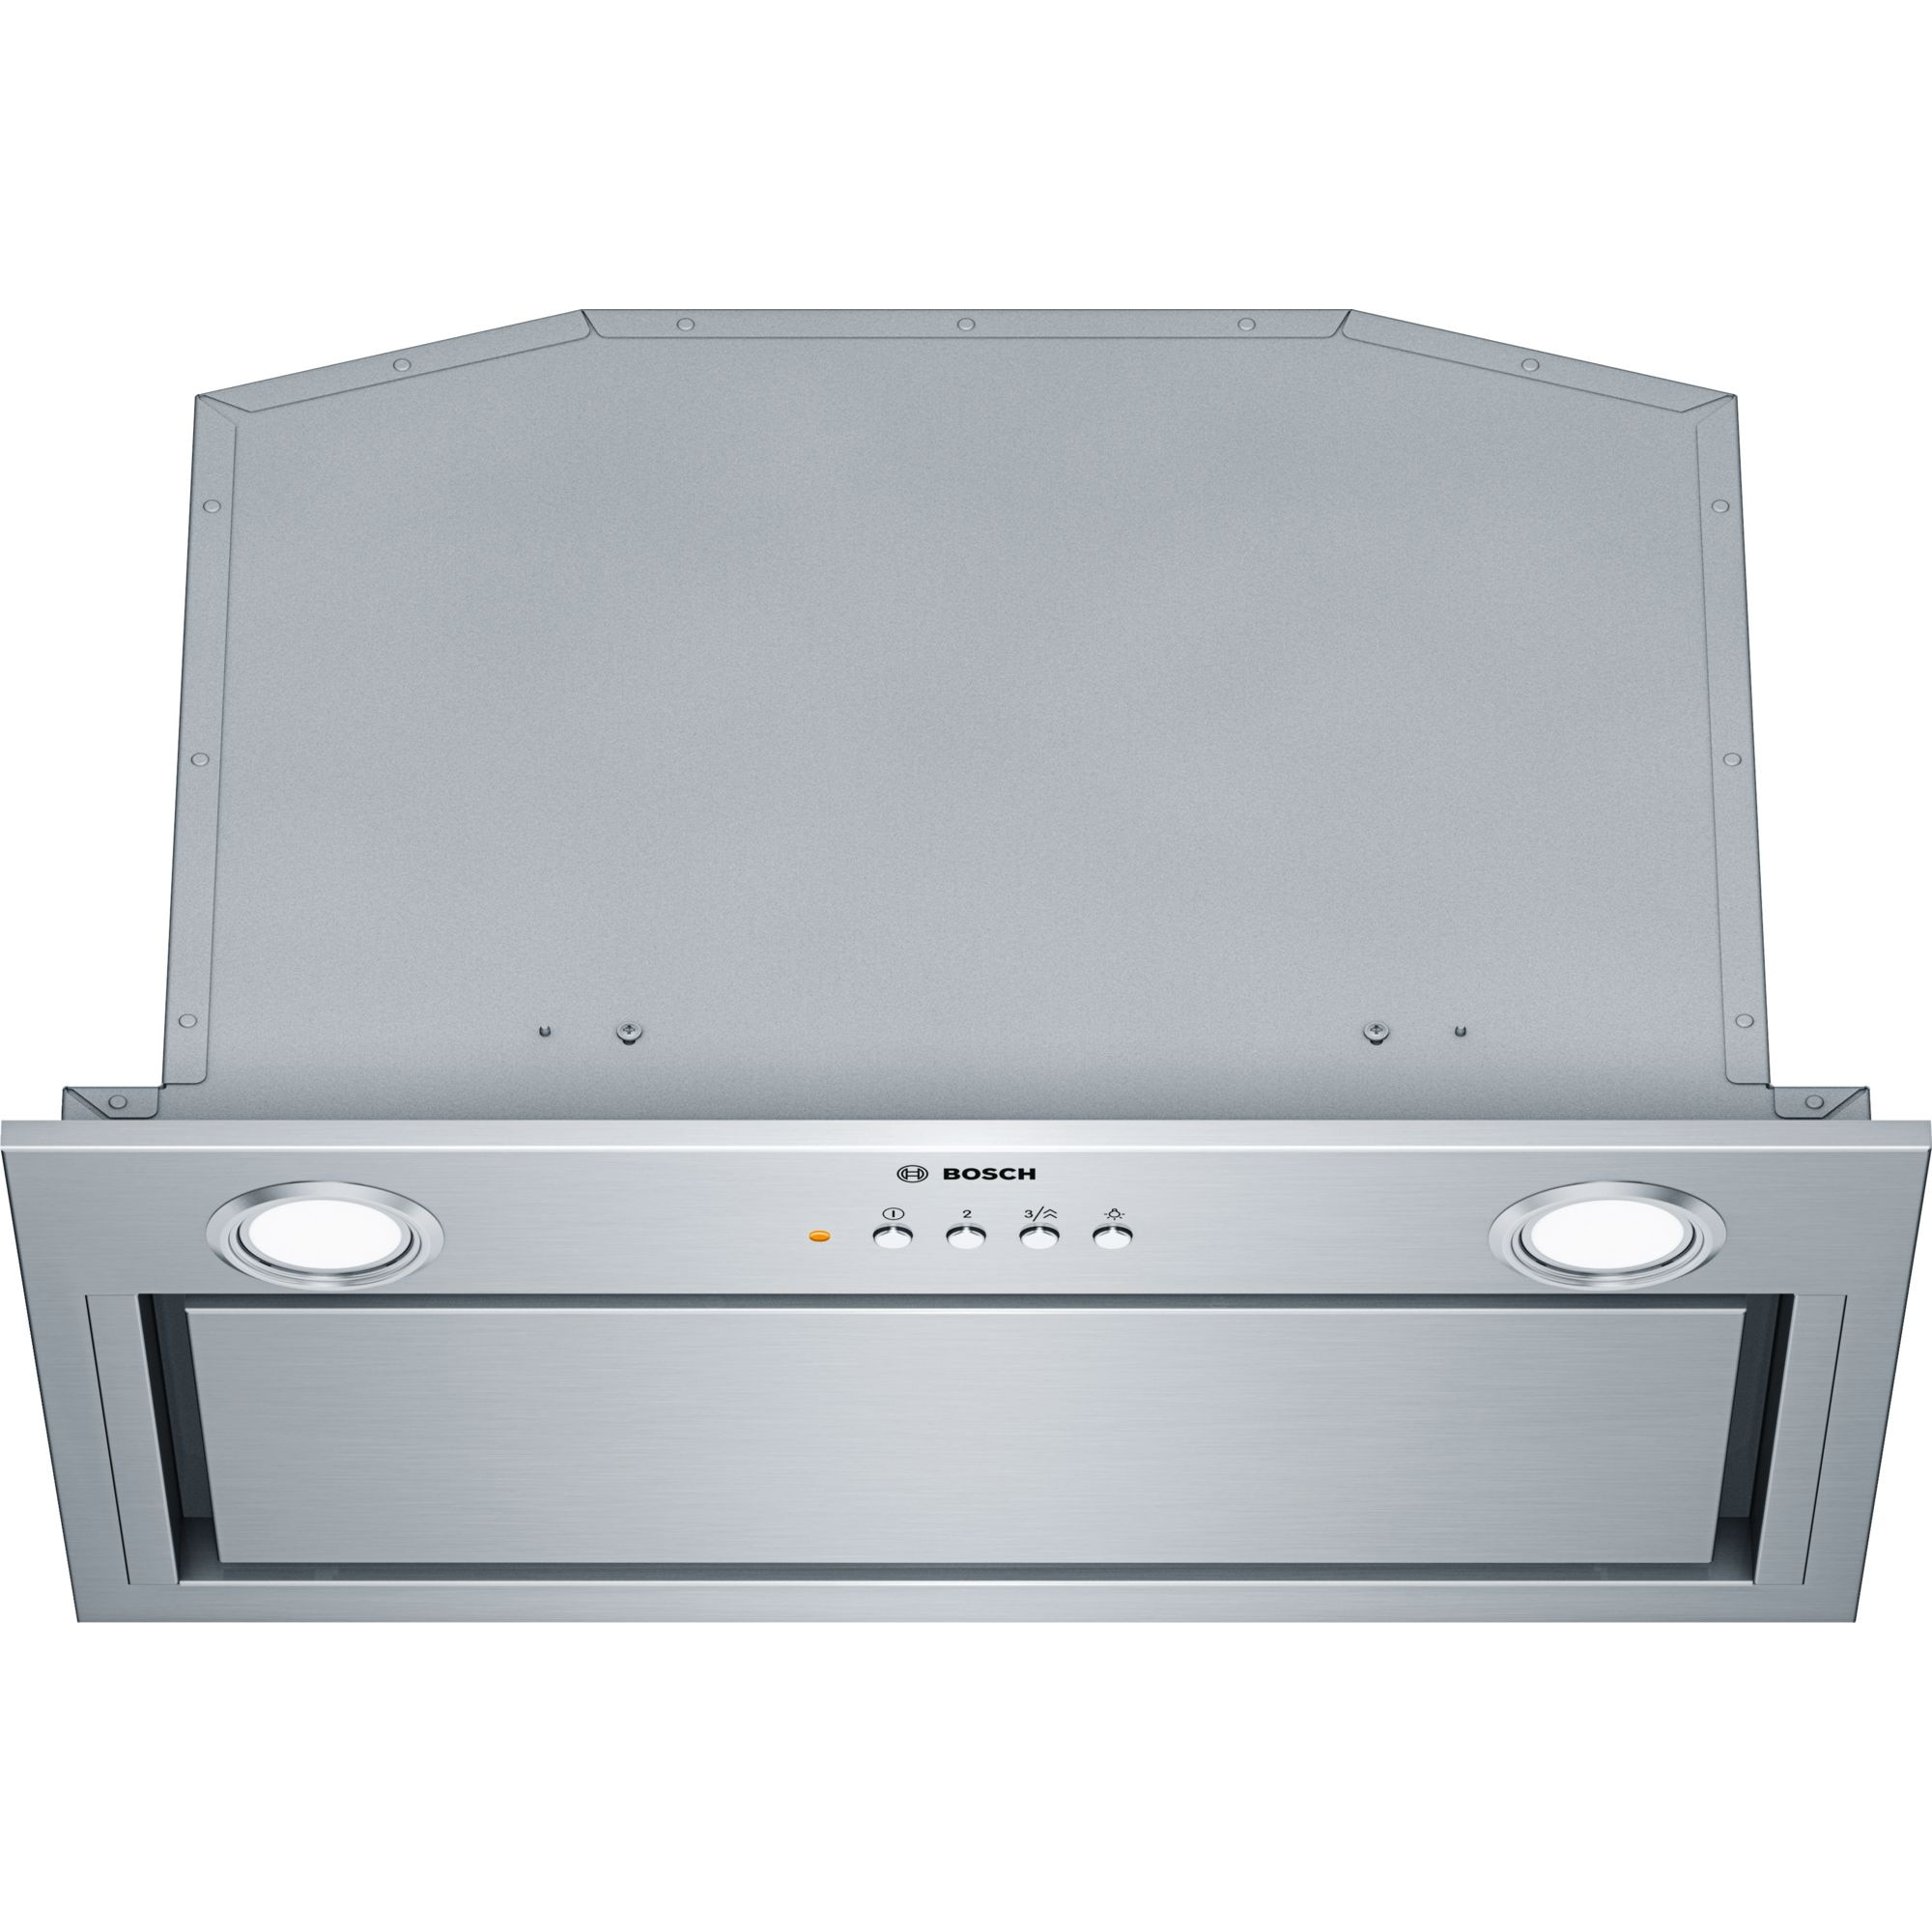 Fotografie Hota incorporabila Bosch DHL585B, Putere de absorbtie 575 mc/h, 52 cm, Argintiu